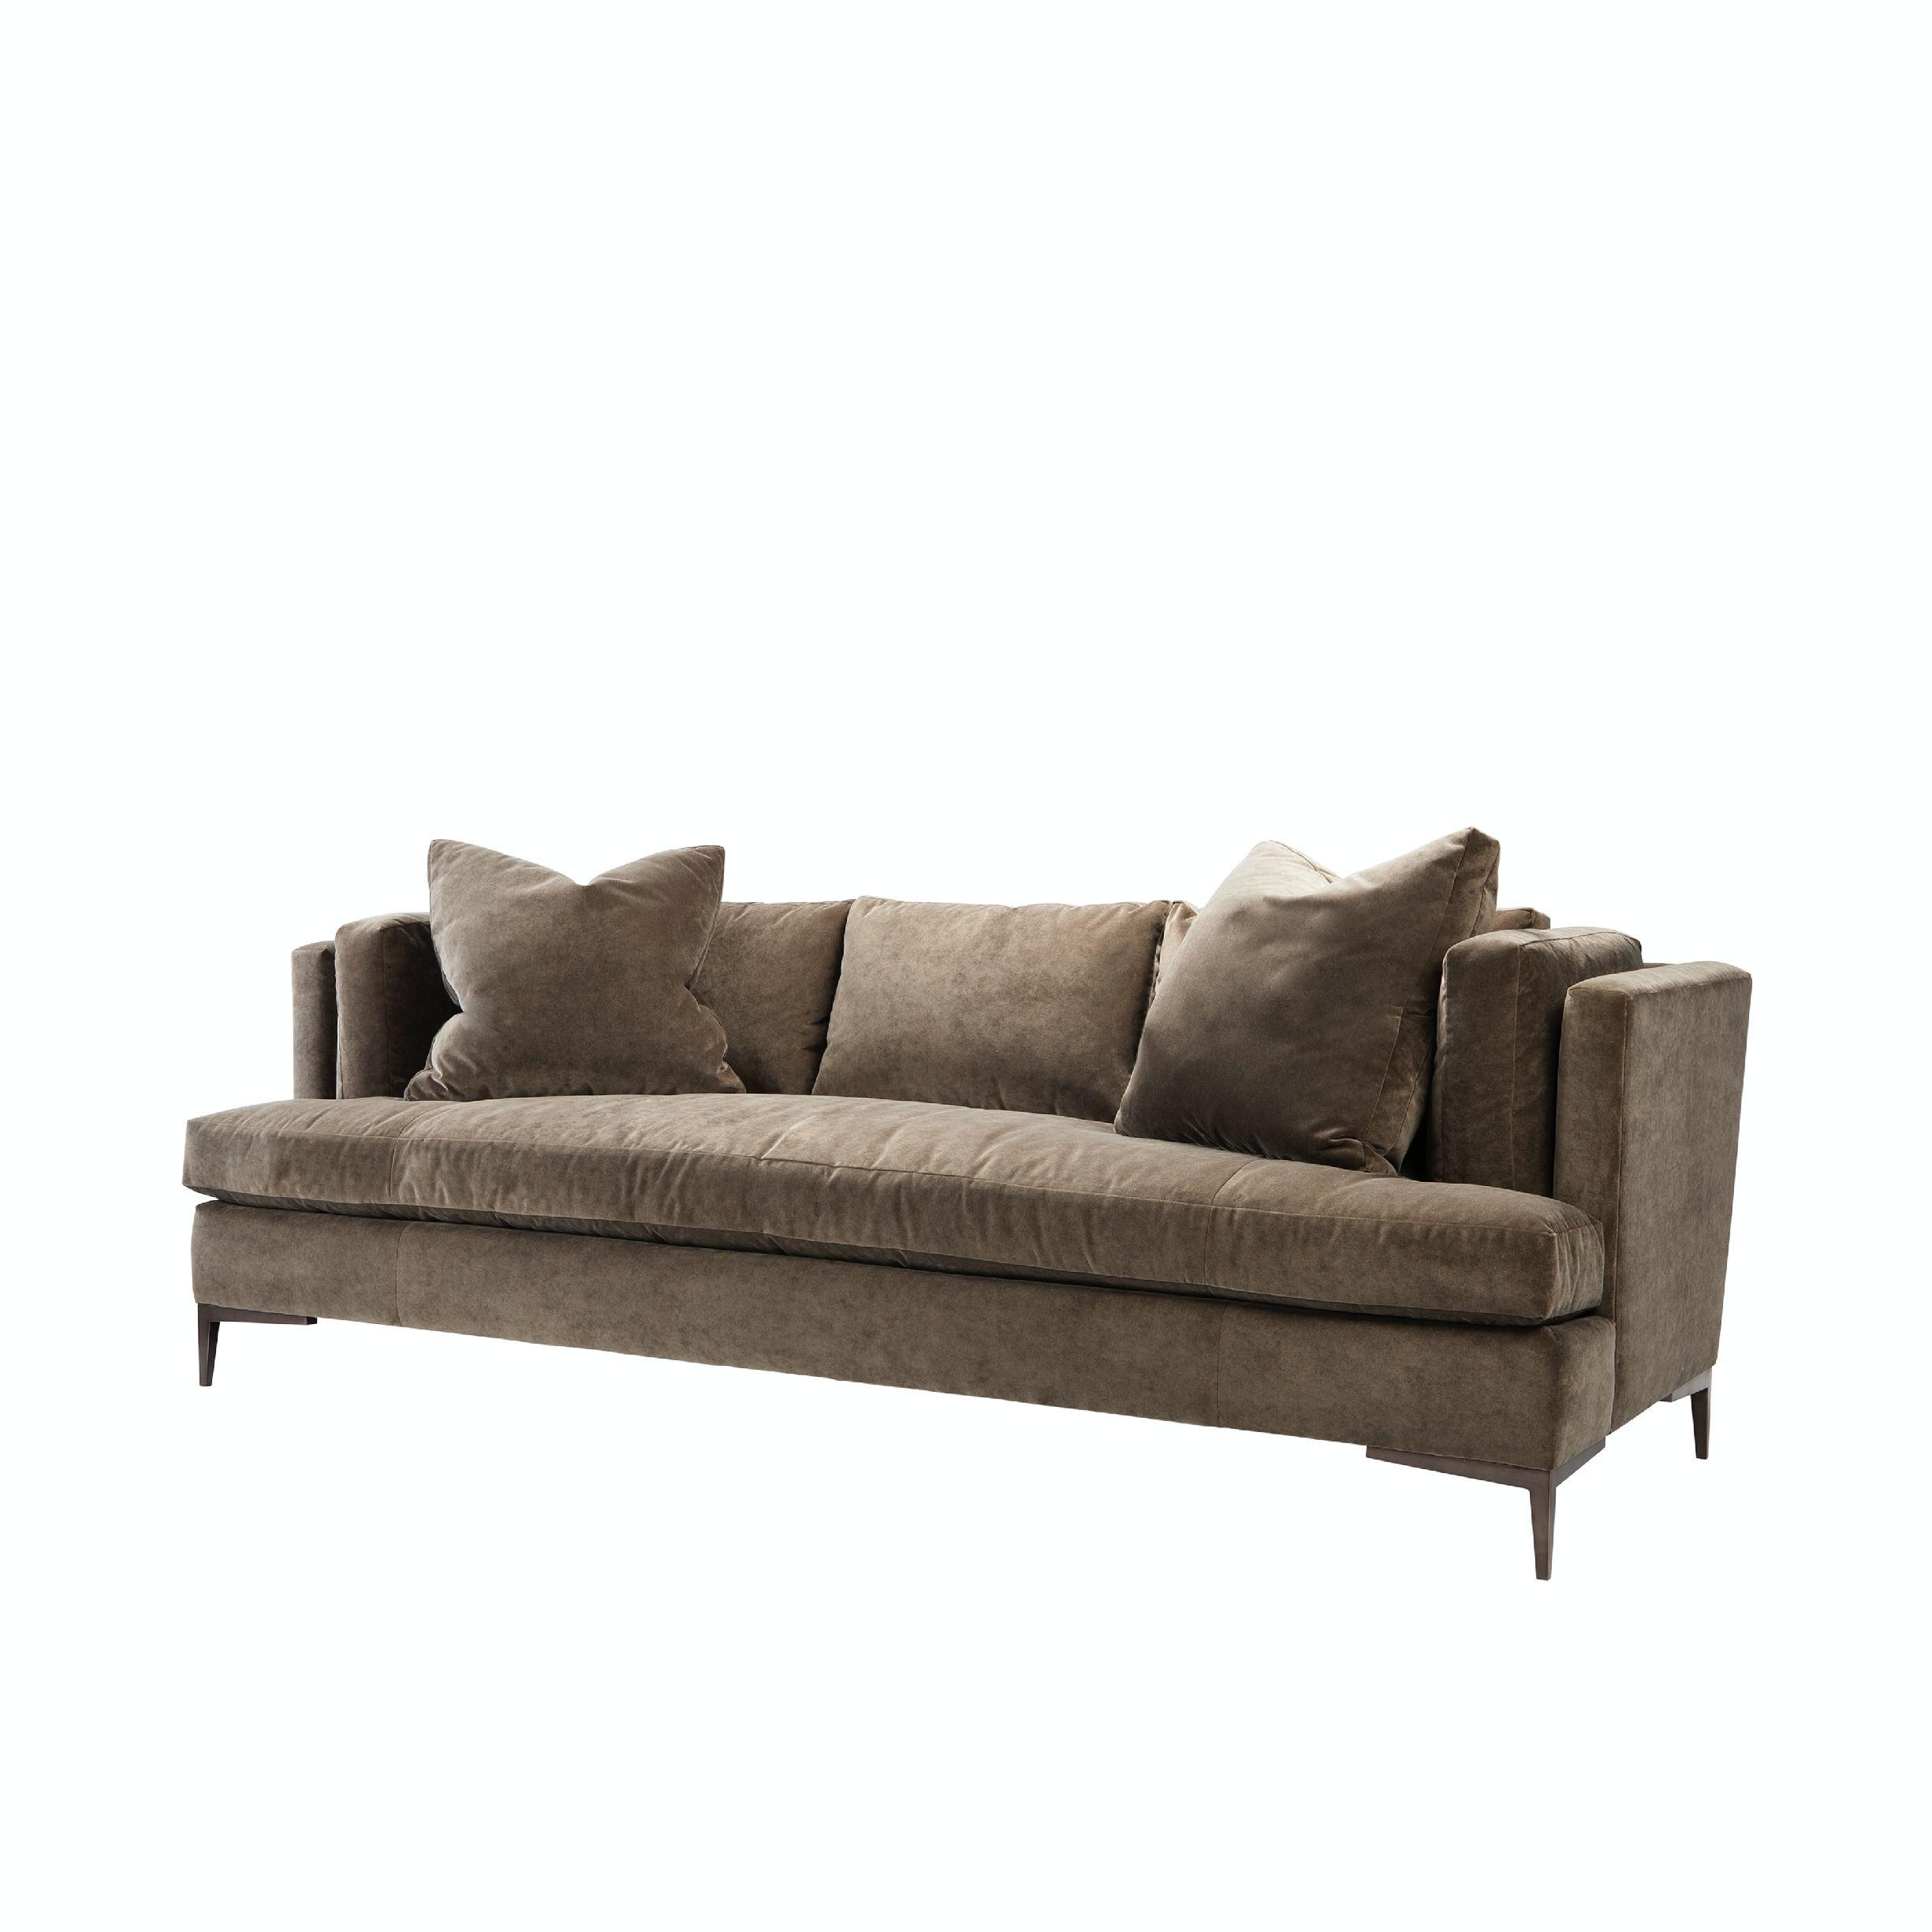 8 way hand tied sofa brands in canada average cost of a bed theodore alexander living room aiden 609 10 noel